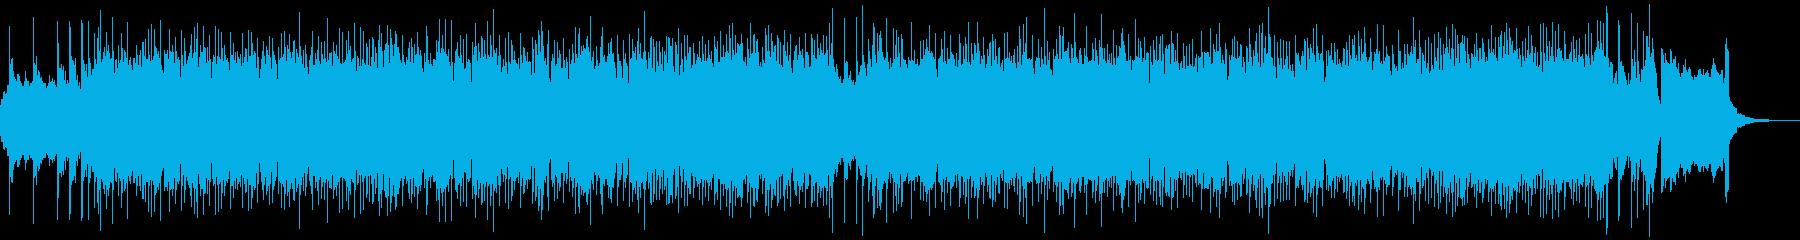 【YouTube】ハプニング!?なロックの再生済みの波形